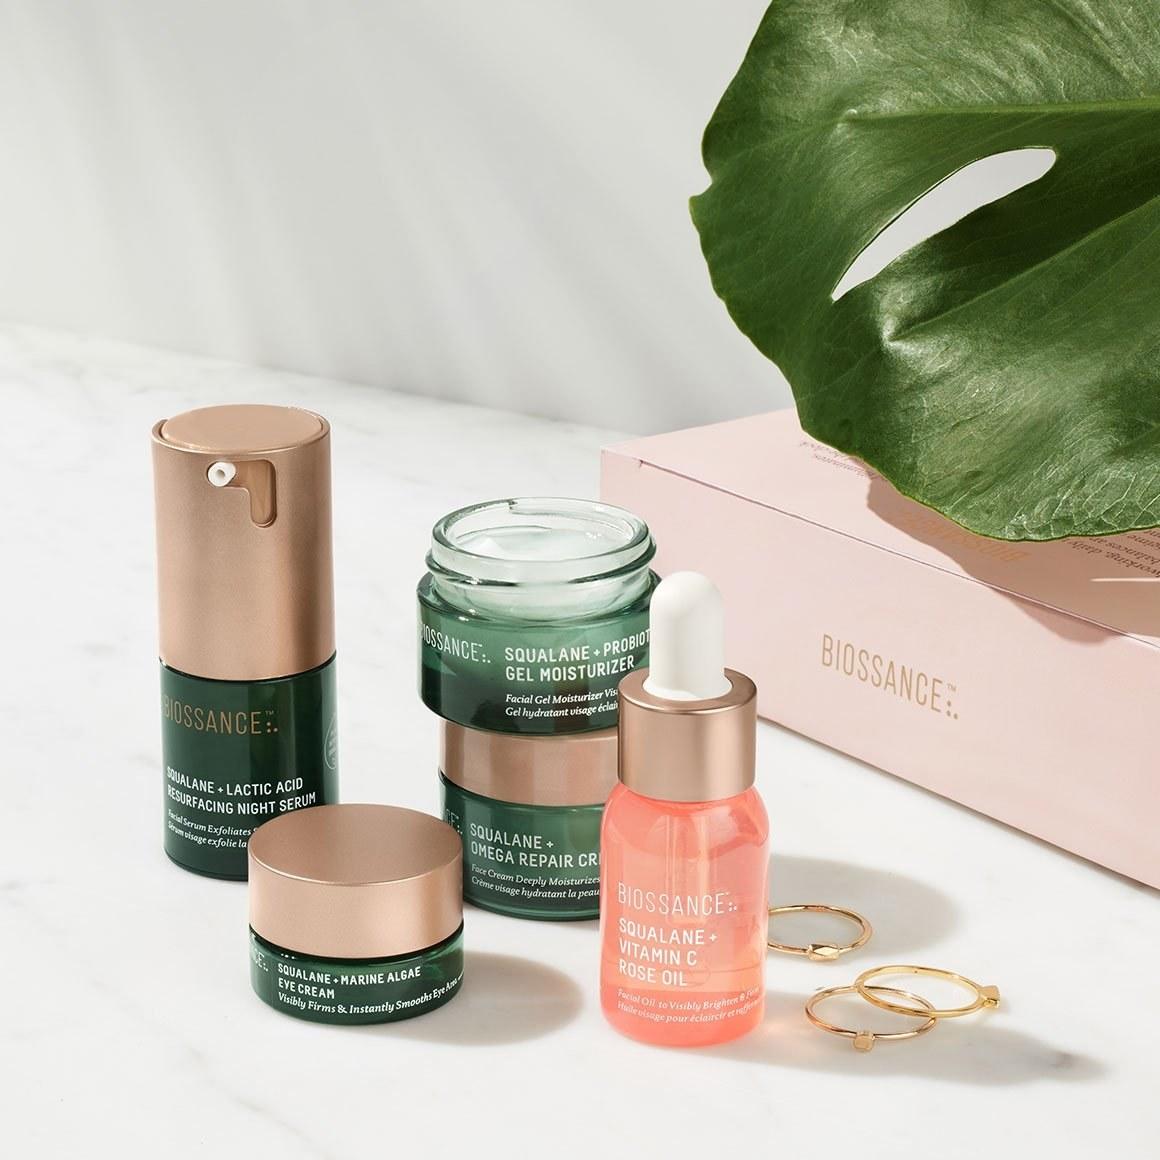 the set with a mini night serum, face oil, eye cream, gel moisturizer, and repair cream